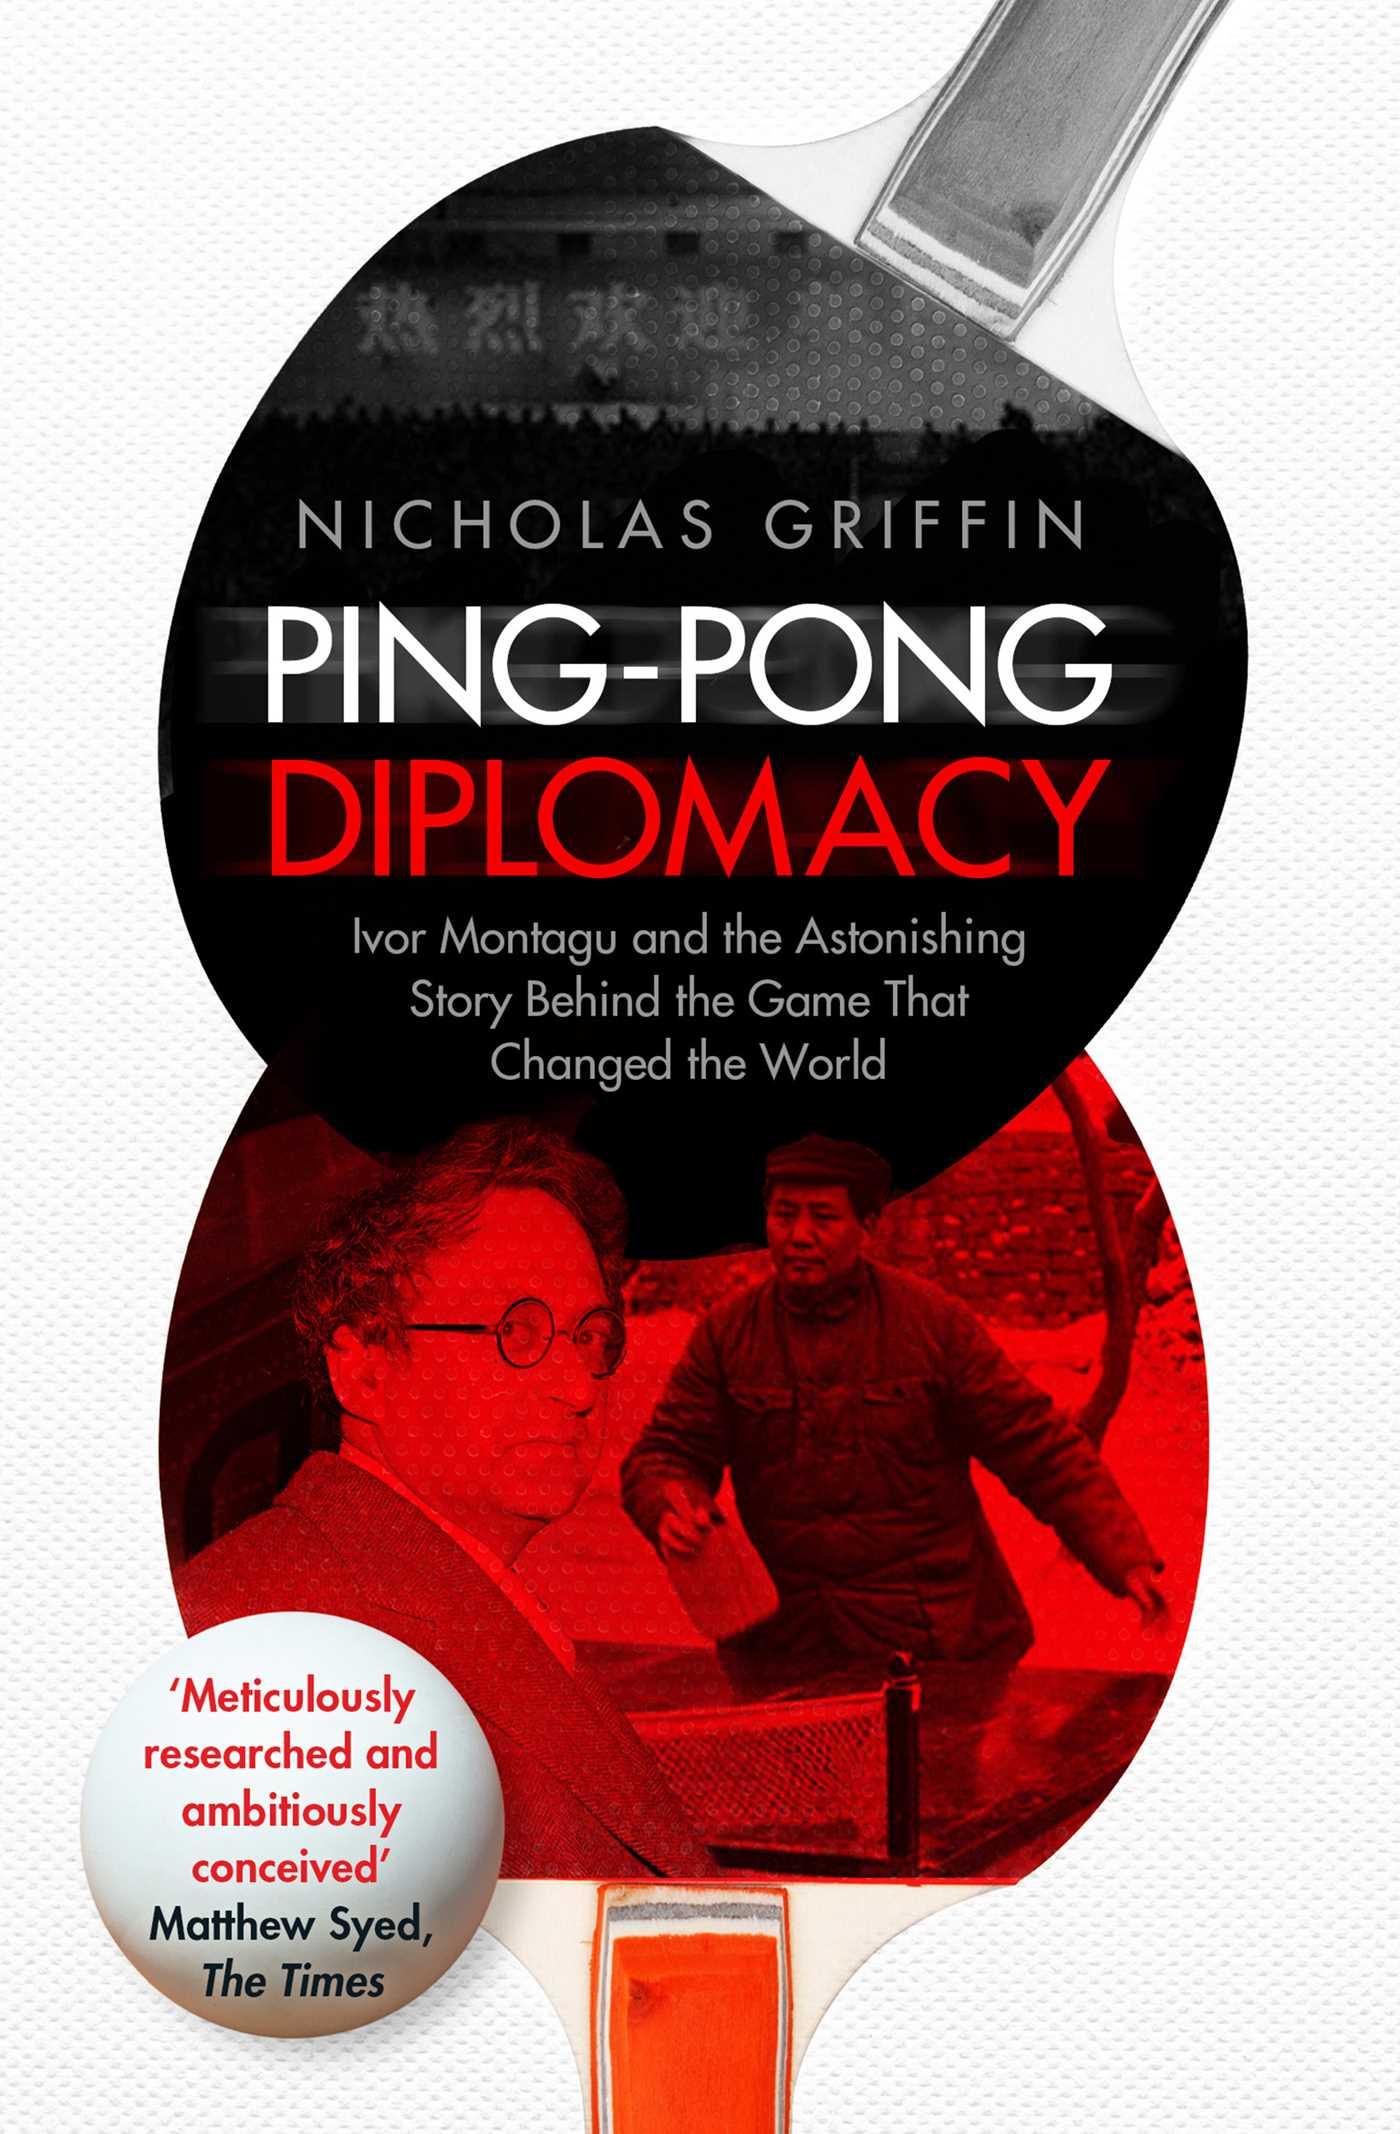 Ping pong diplomacy 9780857207371 hr